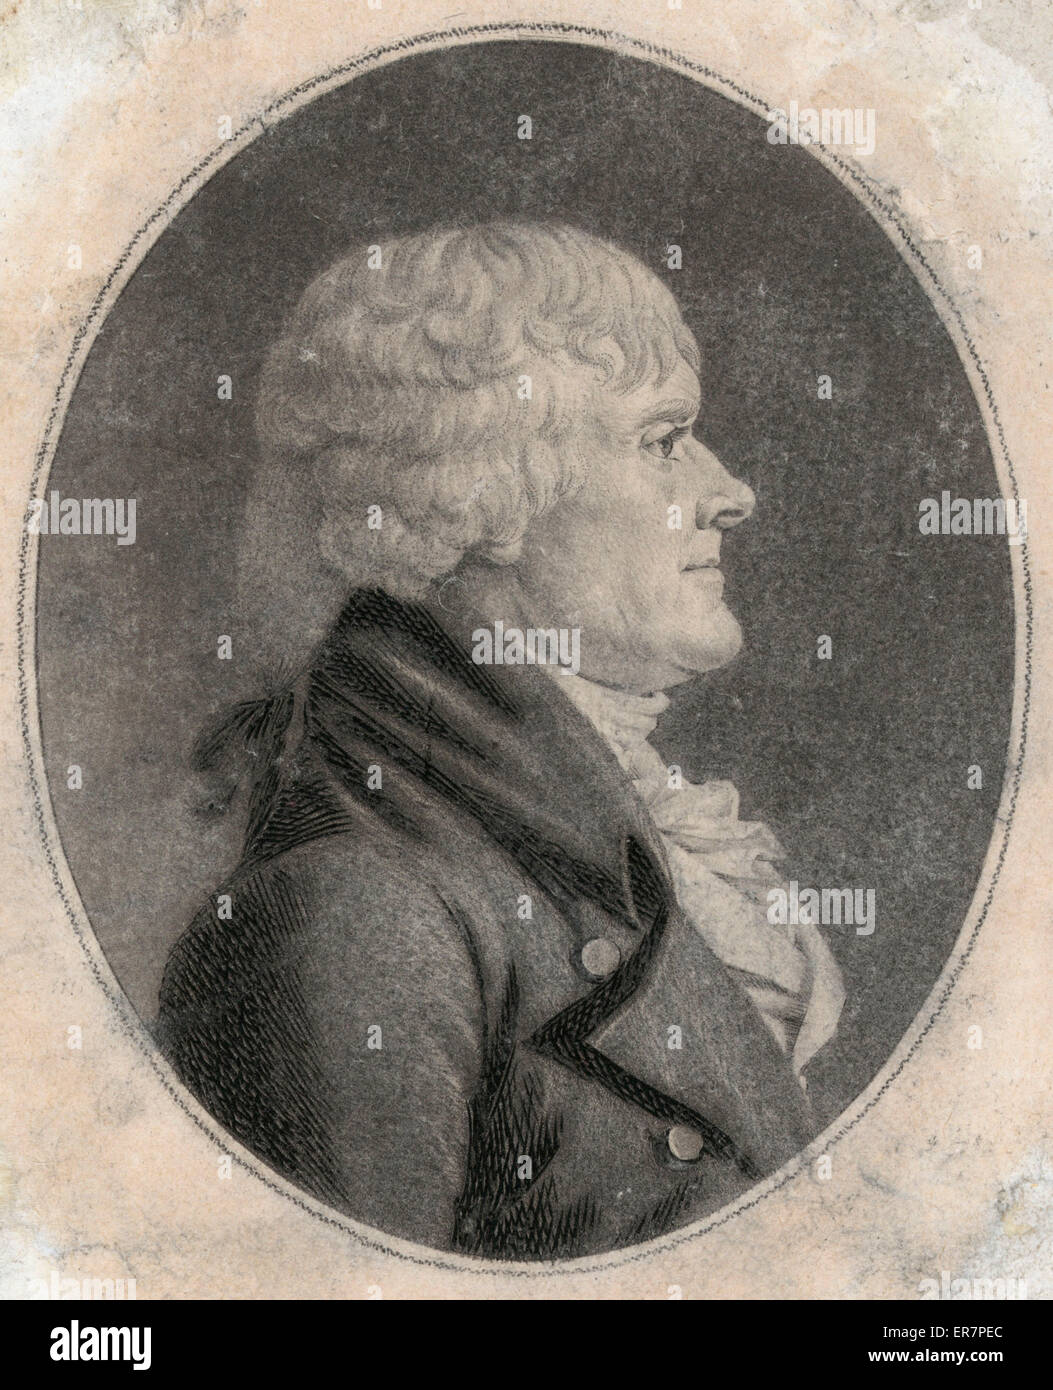 ba9318b9f0d0 Thomas Jefferson